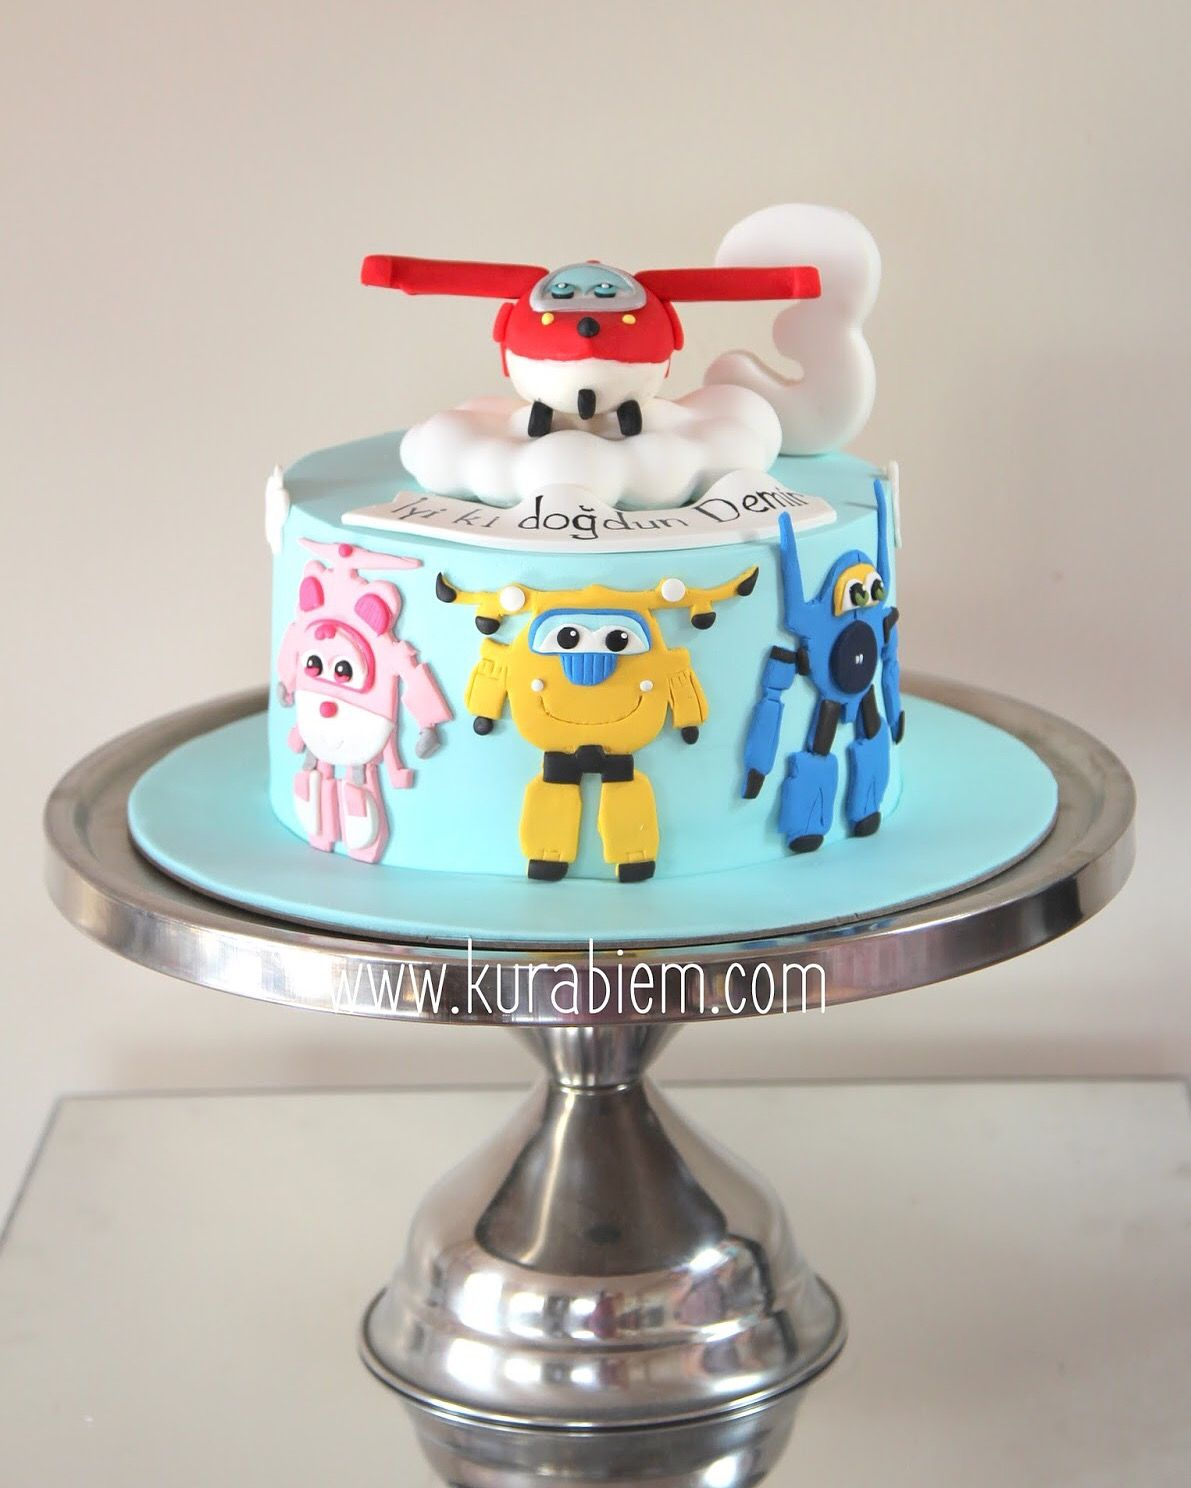 super wings cake harika kanatlar pastas birthday cake. Black Bedroom Furniture Sets. Home Design Ideas